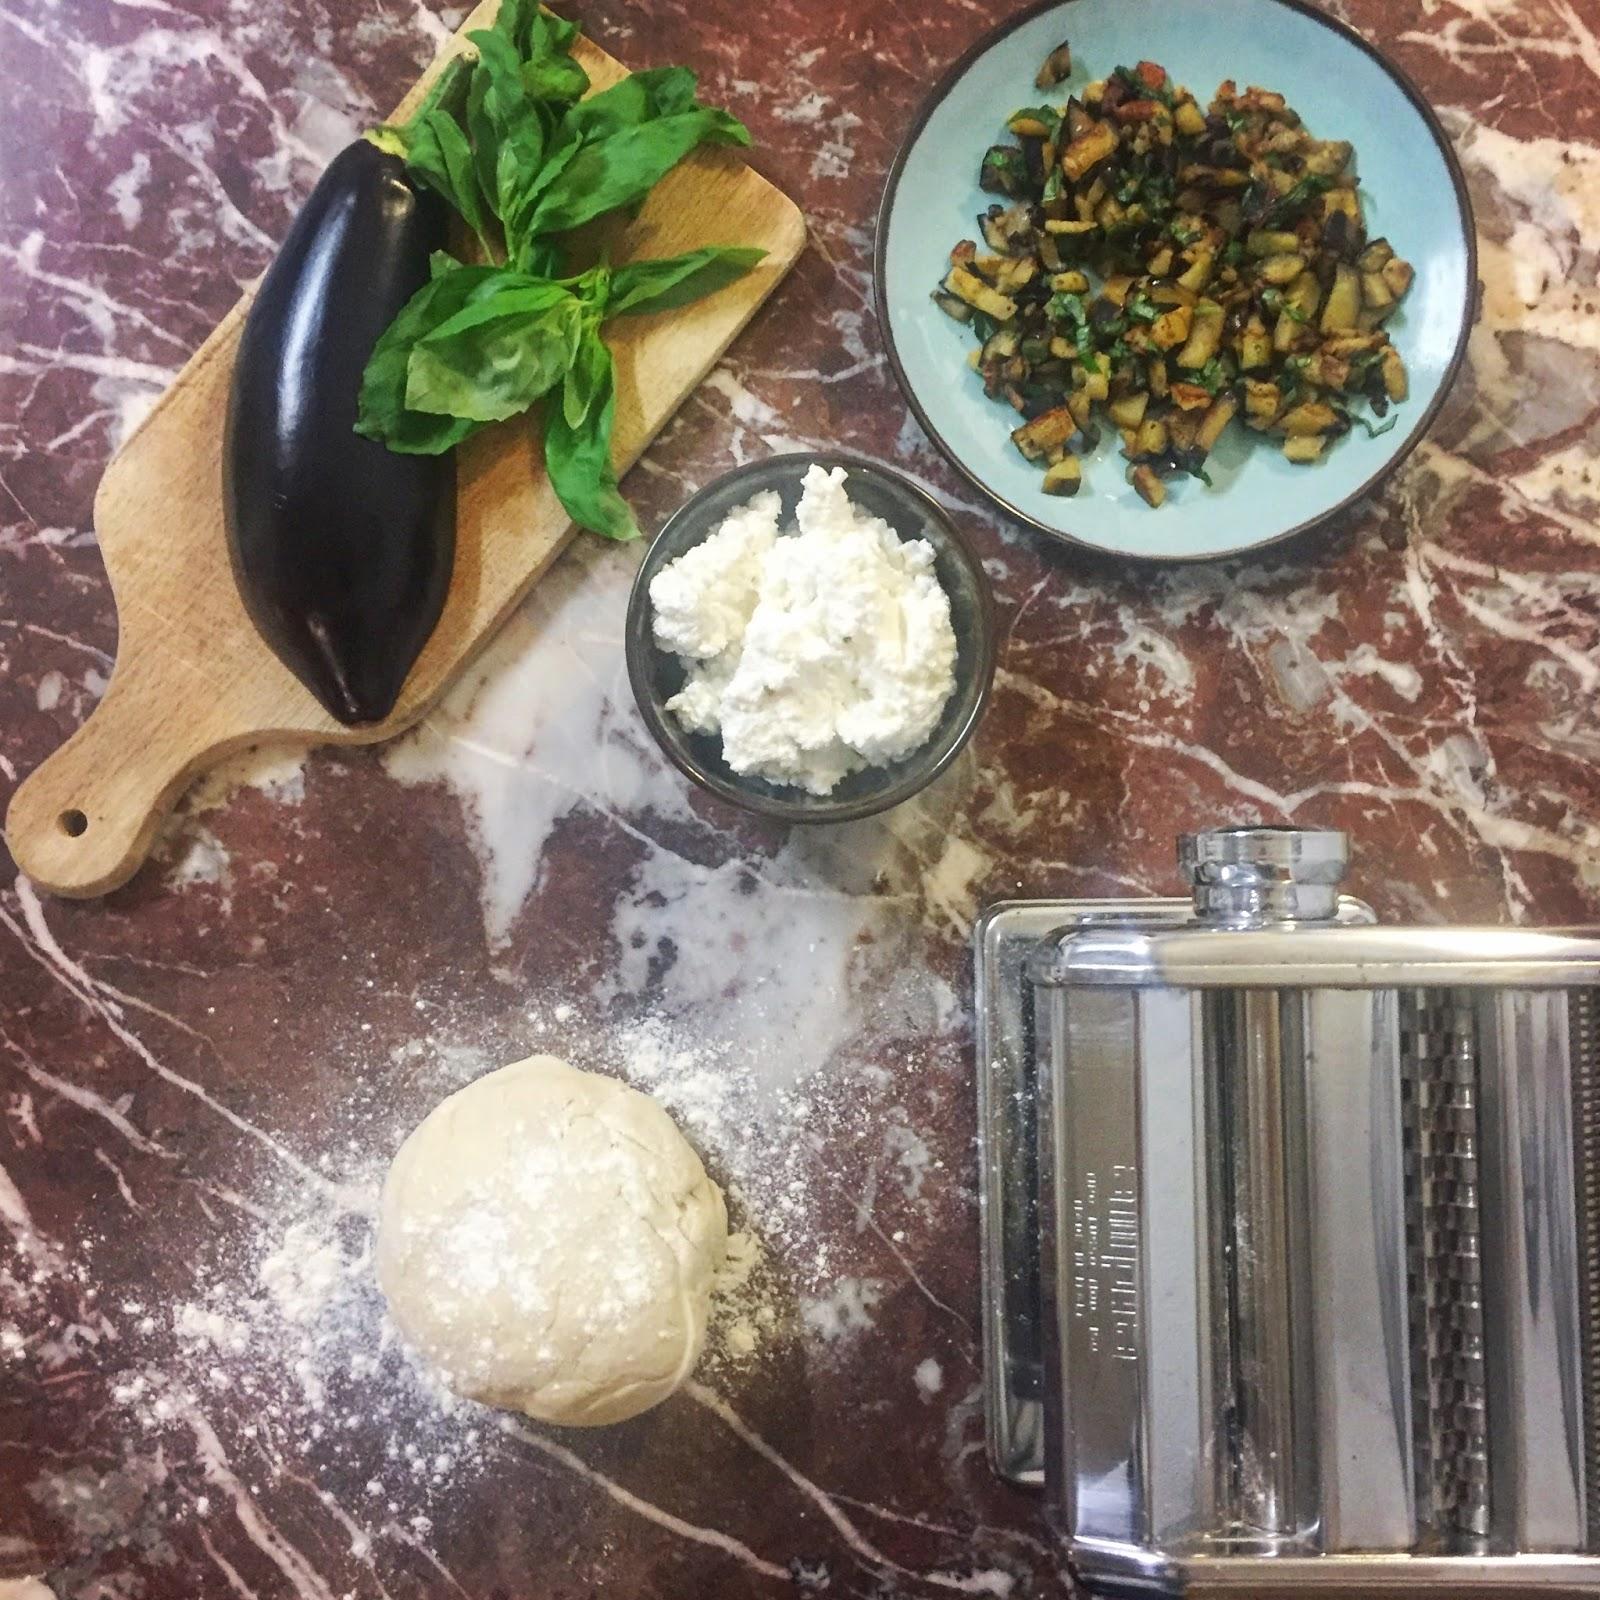 recette facile rapide simple ravioles ravioli aubergine ricotta basilic vegan vegetarien vegetarienne pâtes